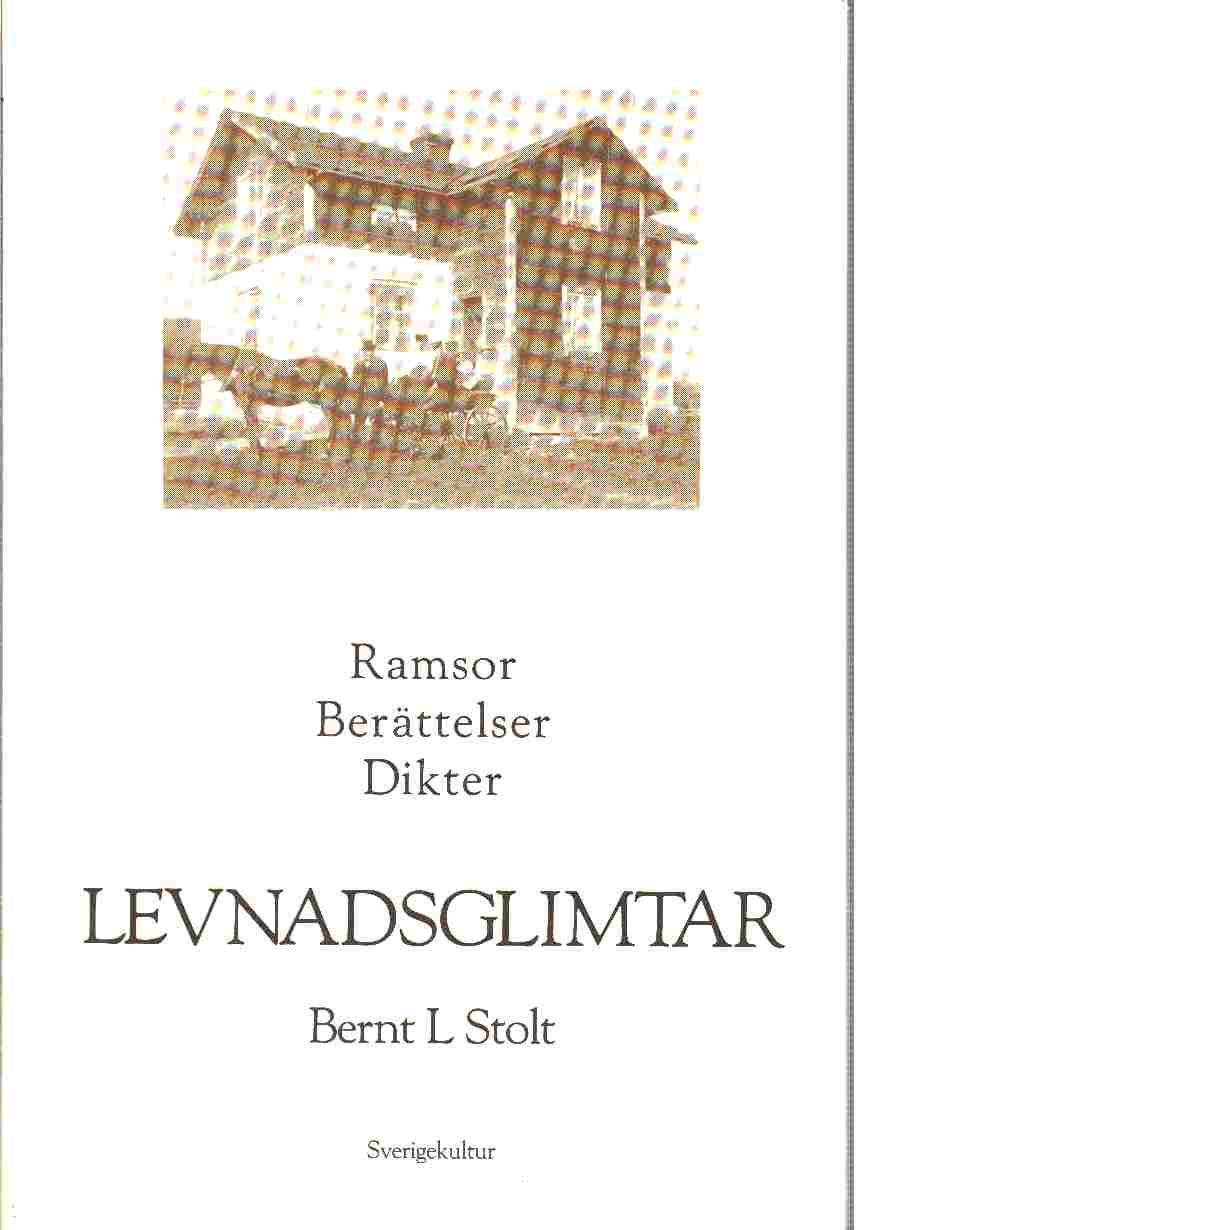 Levnadsglimtar : ramsor, berättelser, dikter - Stolt, Bernt L.,